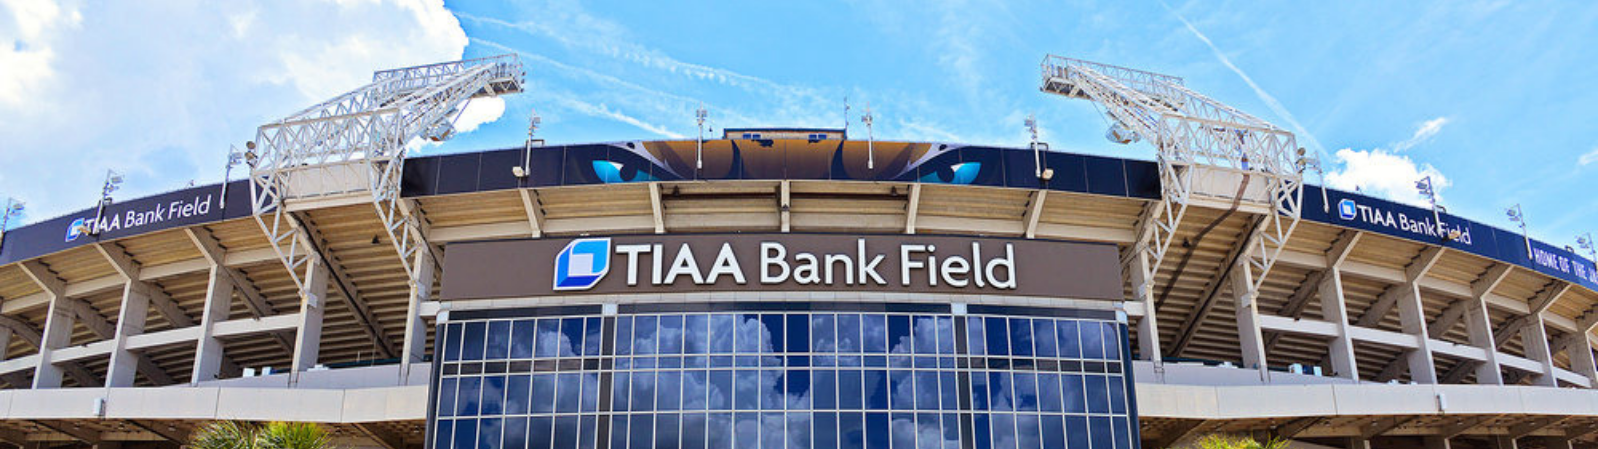 TIAA Bank Filed, in Jacksonville, FL